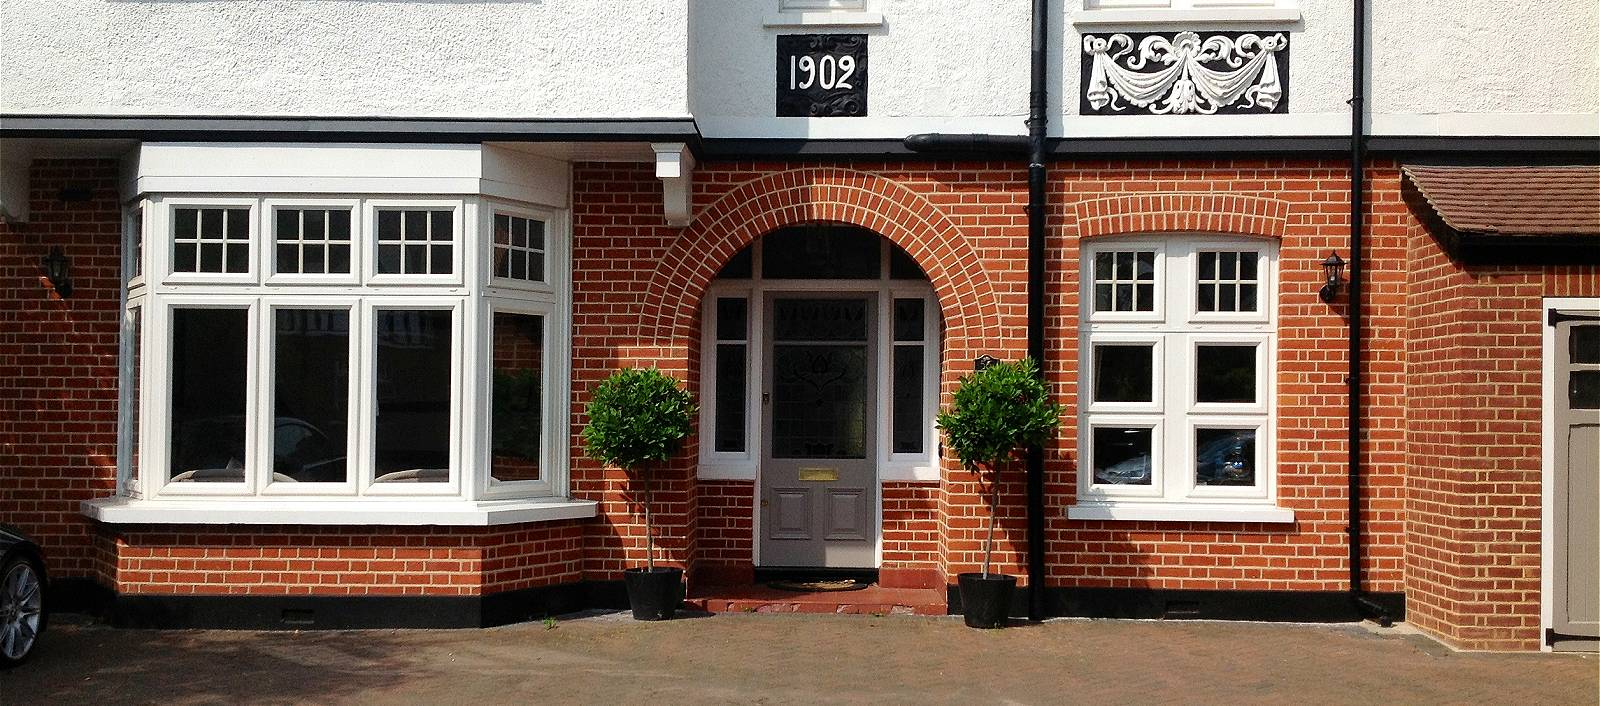 Brick Home Restoration : London repointing and restoration ltd brick cleaning